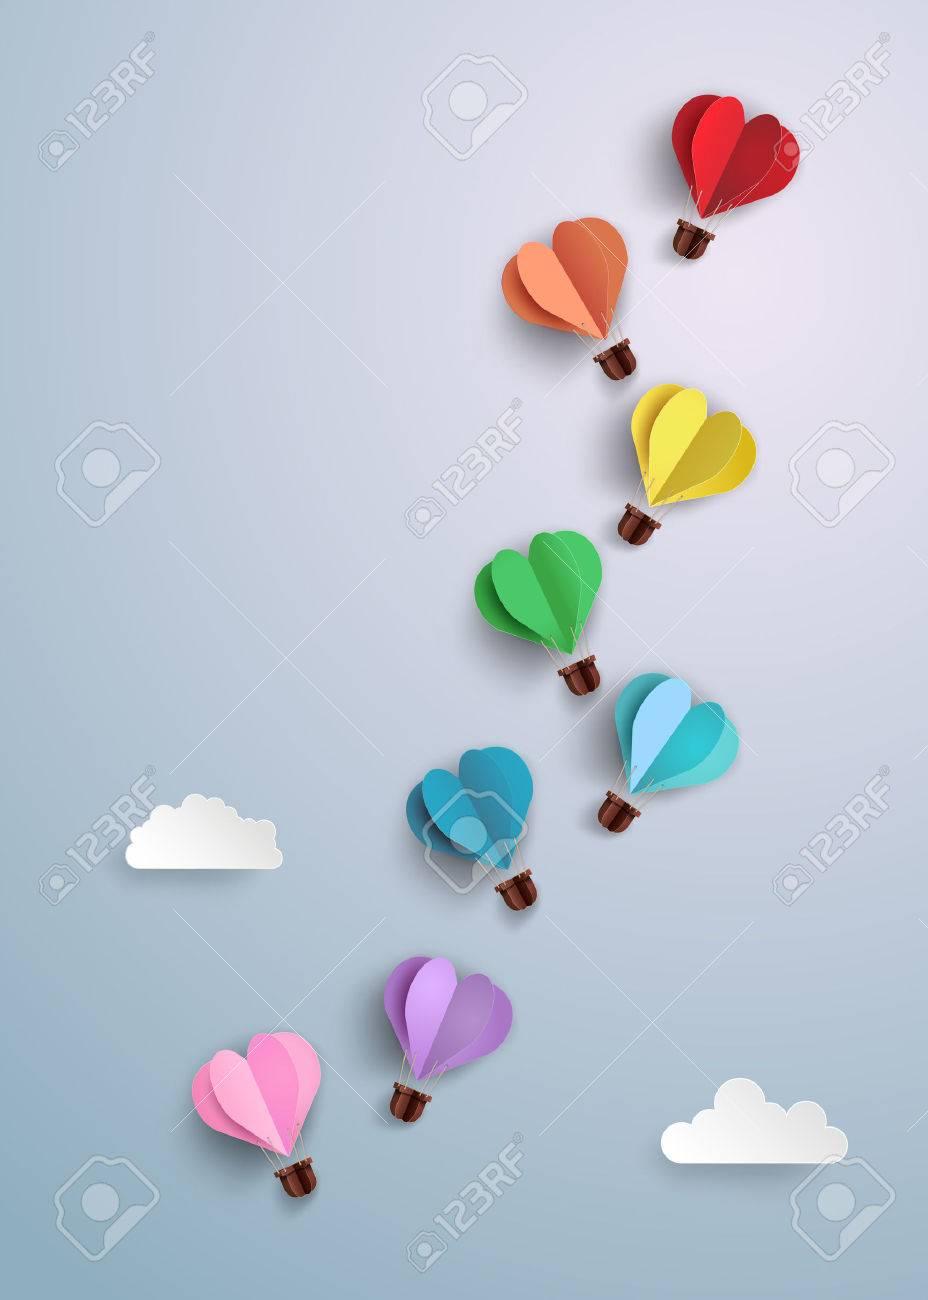 Origami made hot air balloon in a heart shape royalty free origami made hot air balloon in a heart shape stock vector 54021375 jeuxipadfo Choice Image